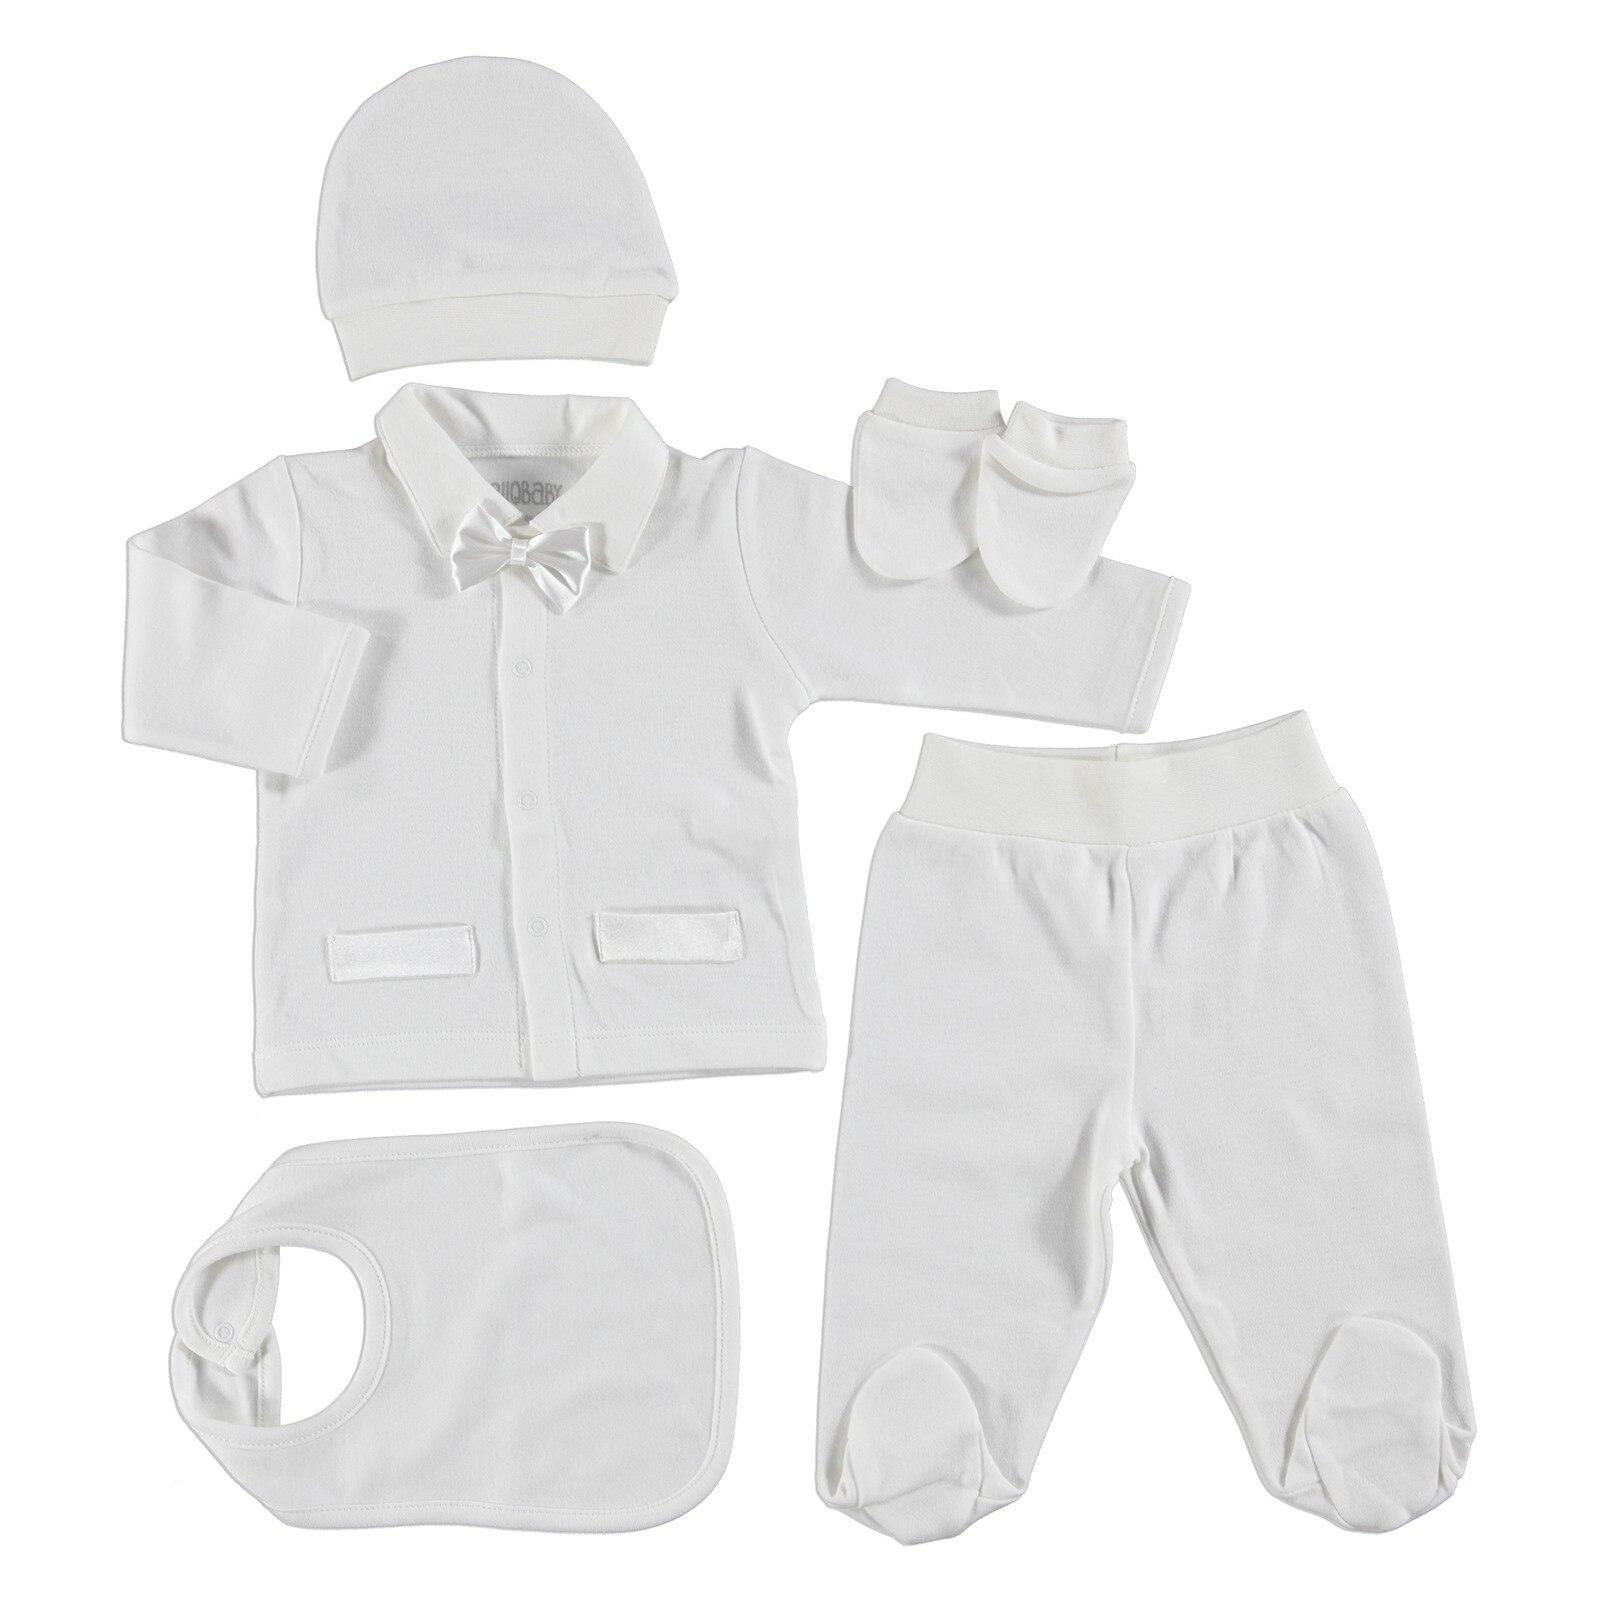 Ebebek HelloBaby Bowtie Baby Newborn Hospital Pack 5 Pcs (Newborn Boy Clothes Toddler Infant Set)